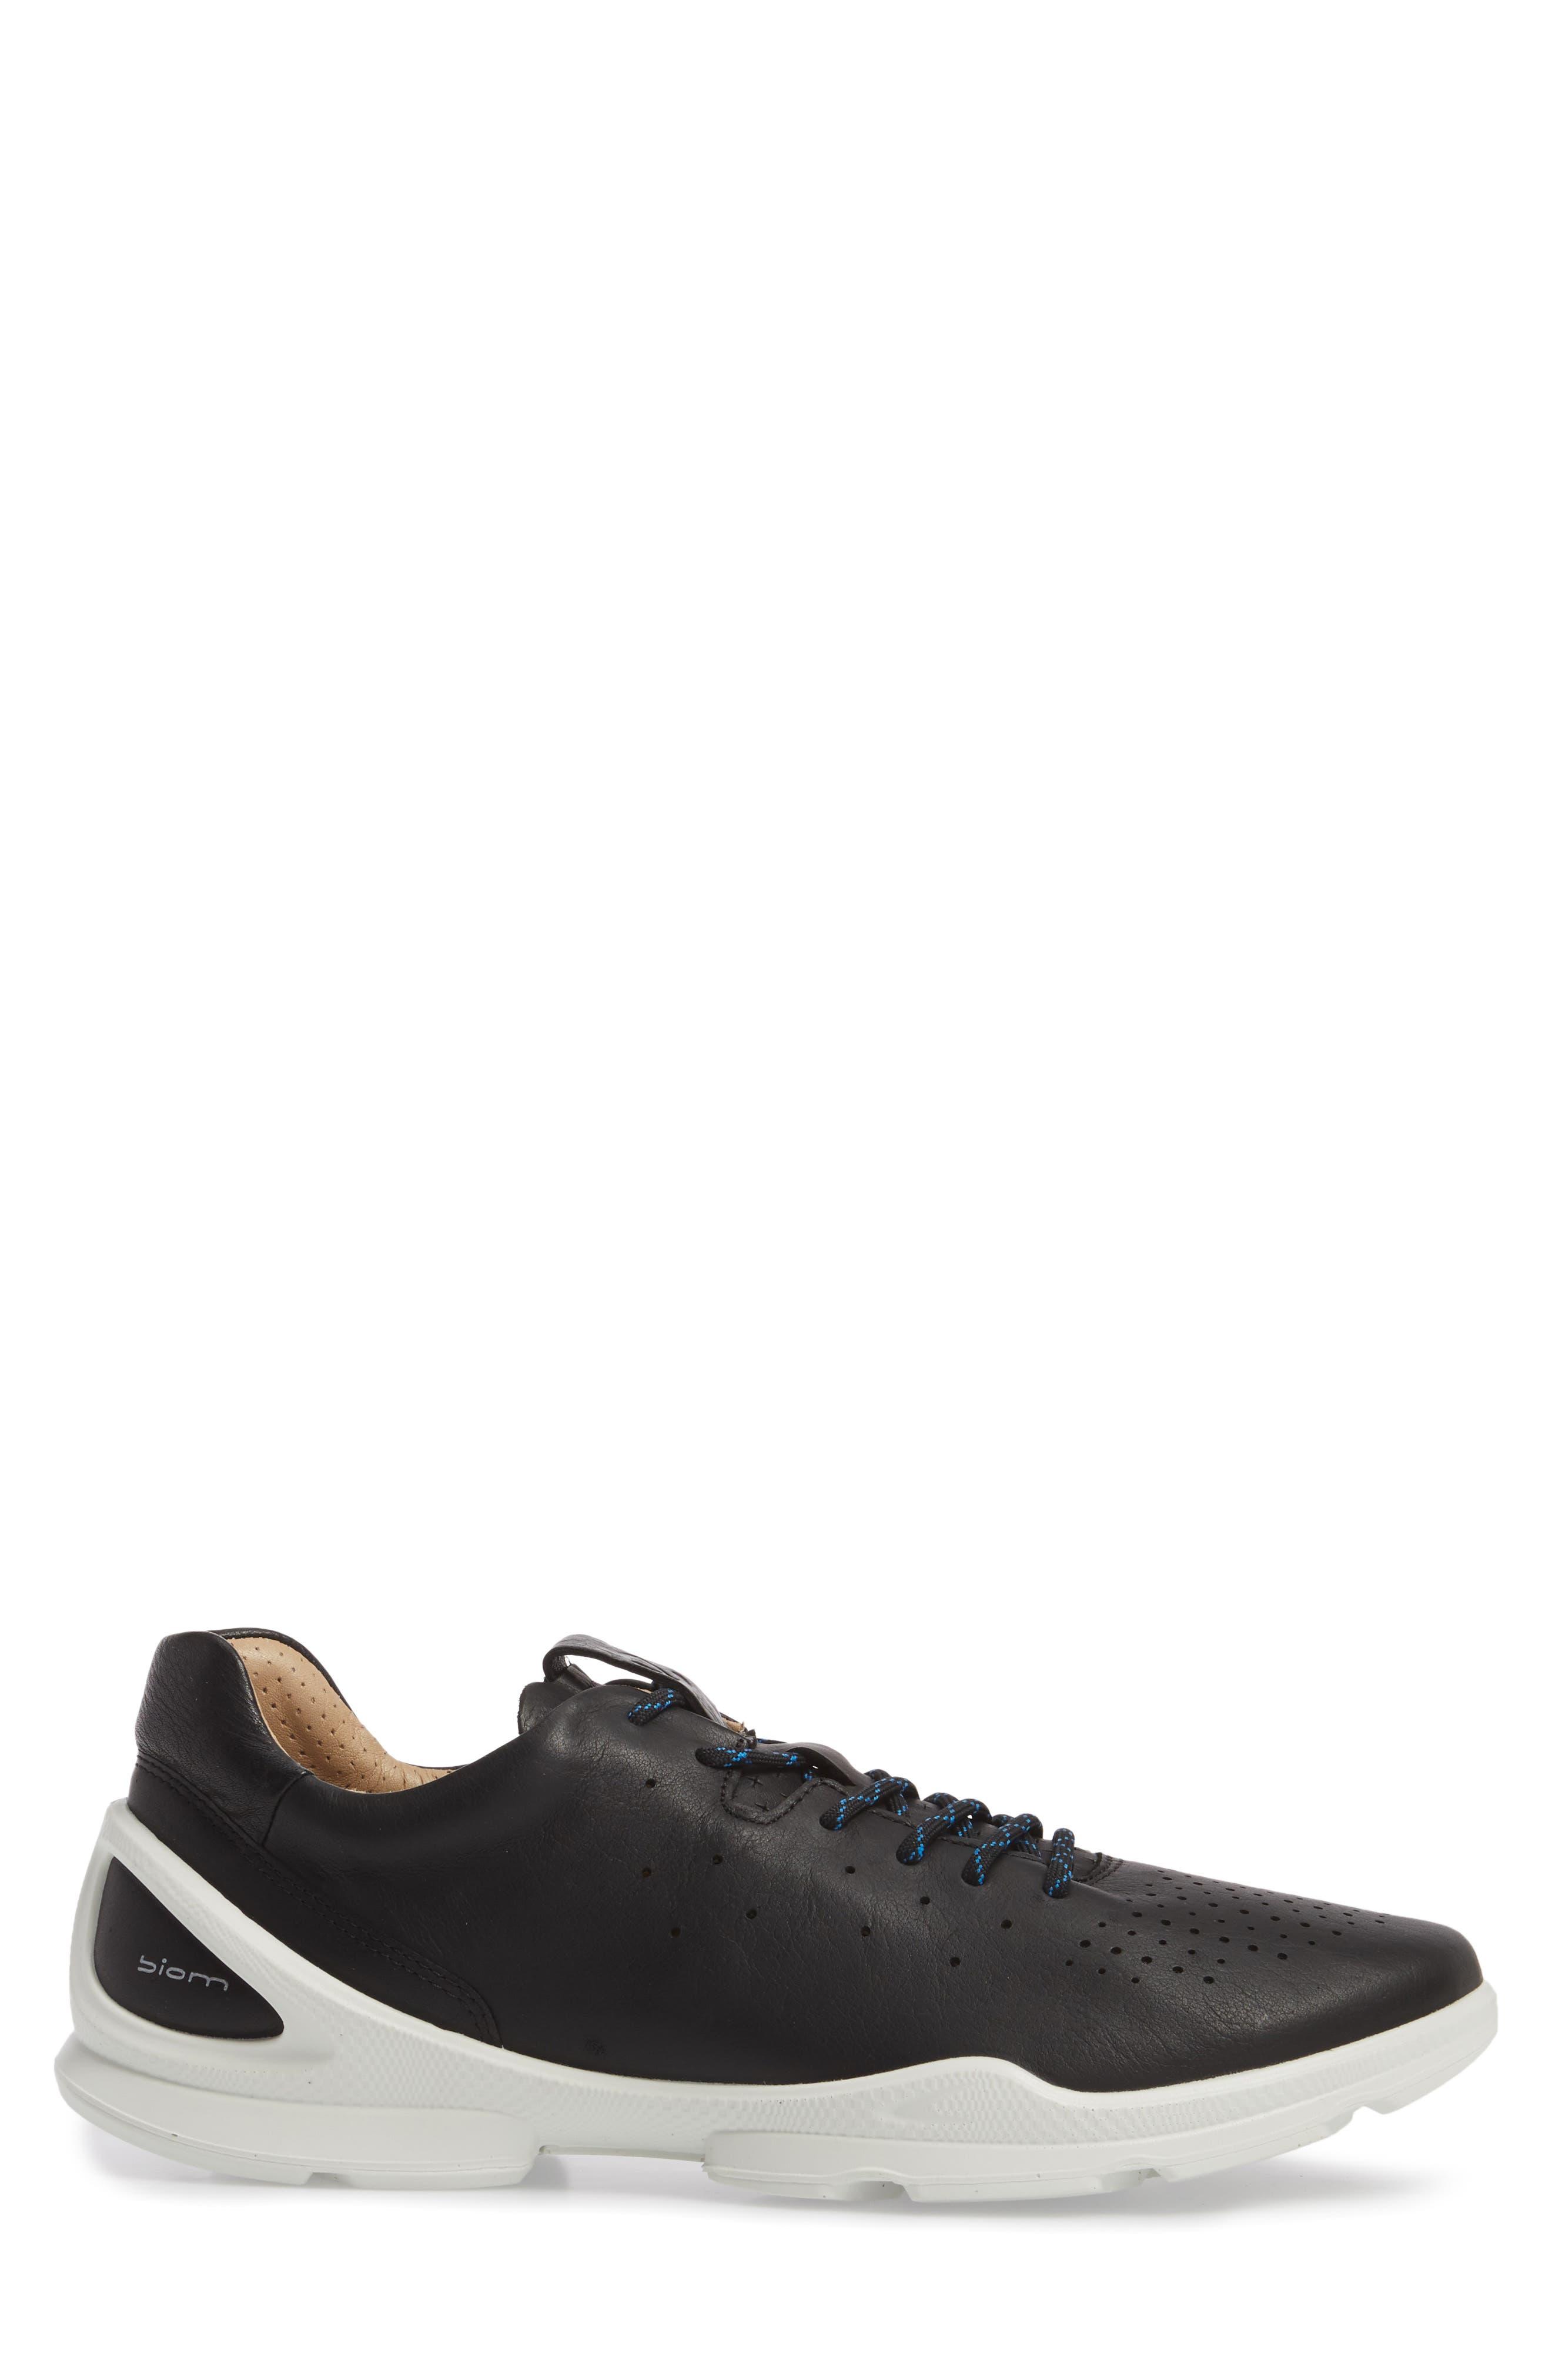 Biom Street Sneaker,                             Alternate thumbnail 3, color,                             008